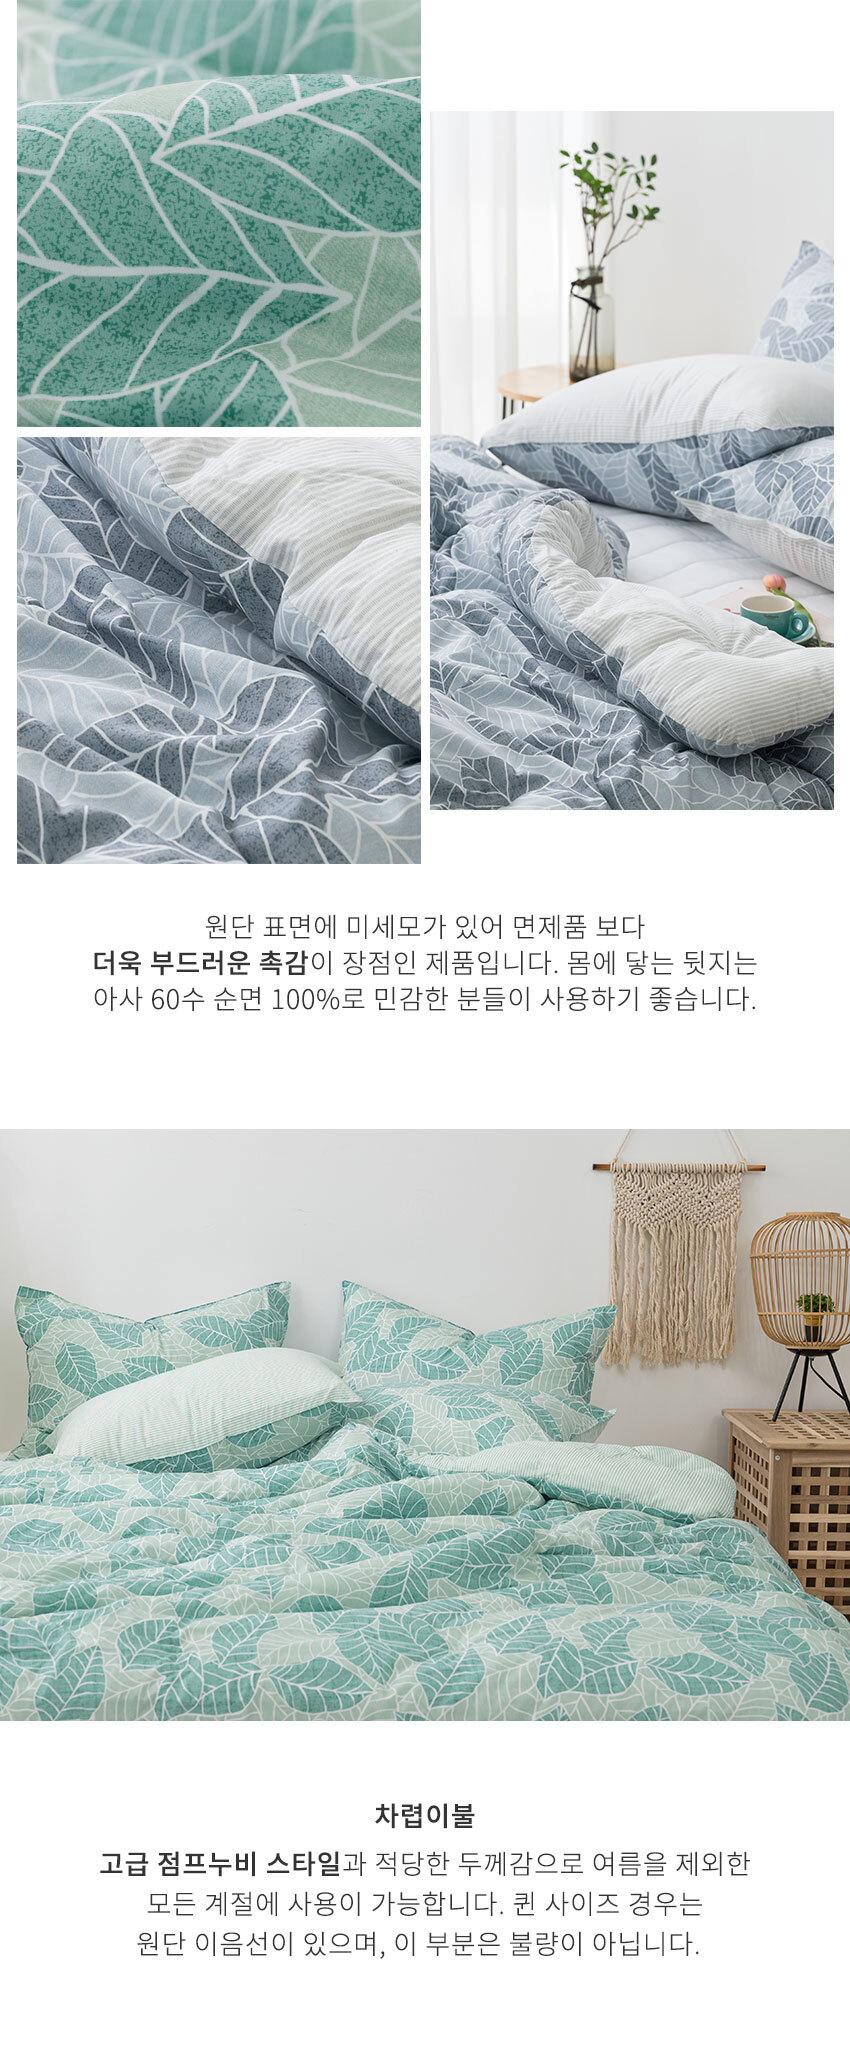 unique_bed_02.jpg